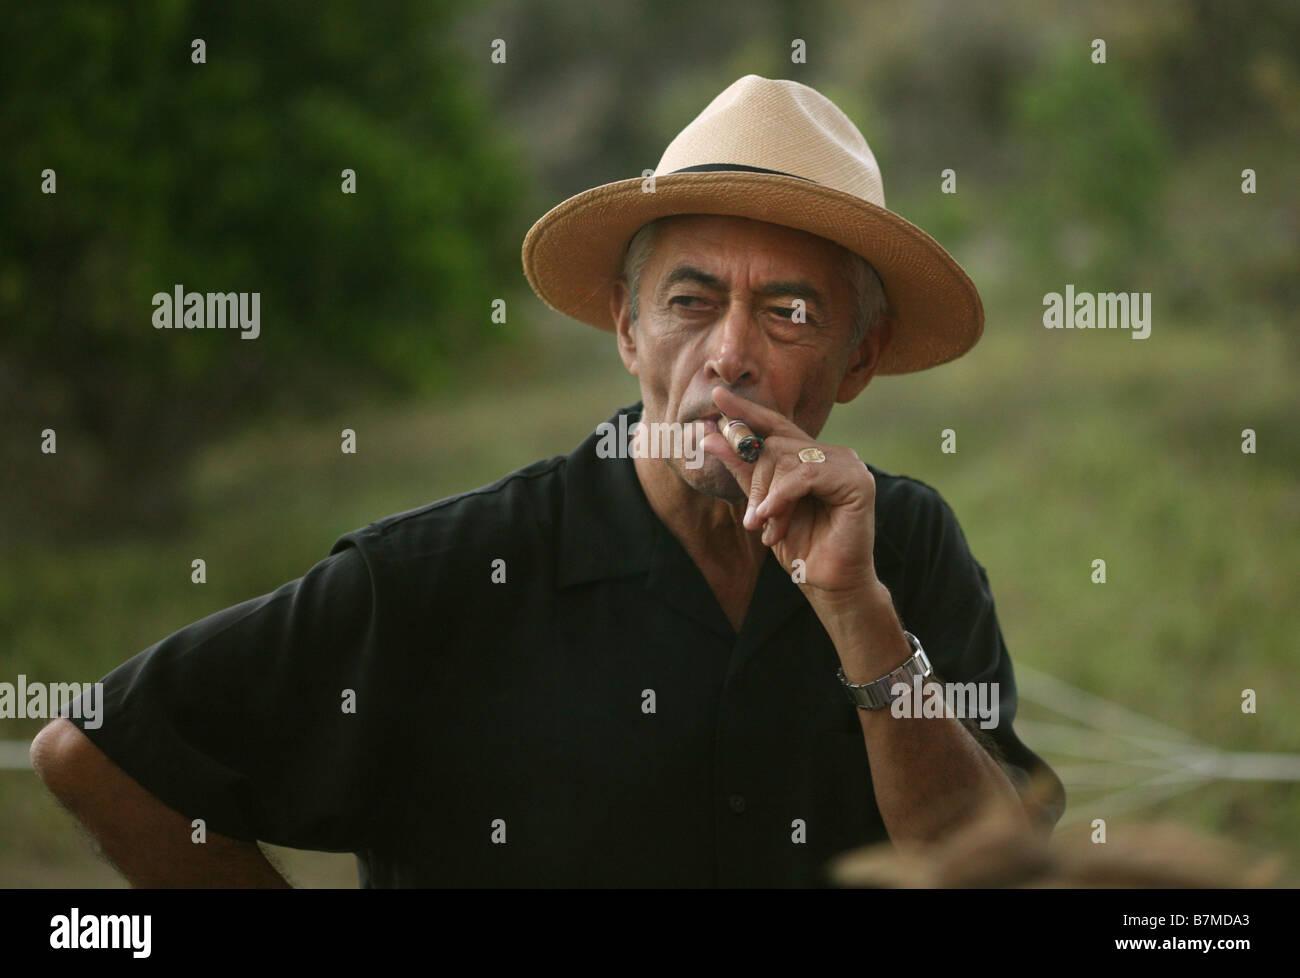 9b239c97a3b161 A man in a Panama hat smokes a Cuban cigar Stock Photo: 21962475 - Alamy